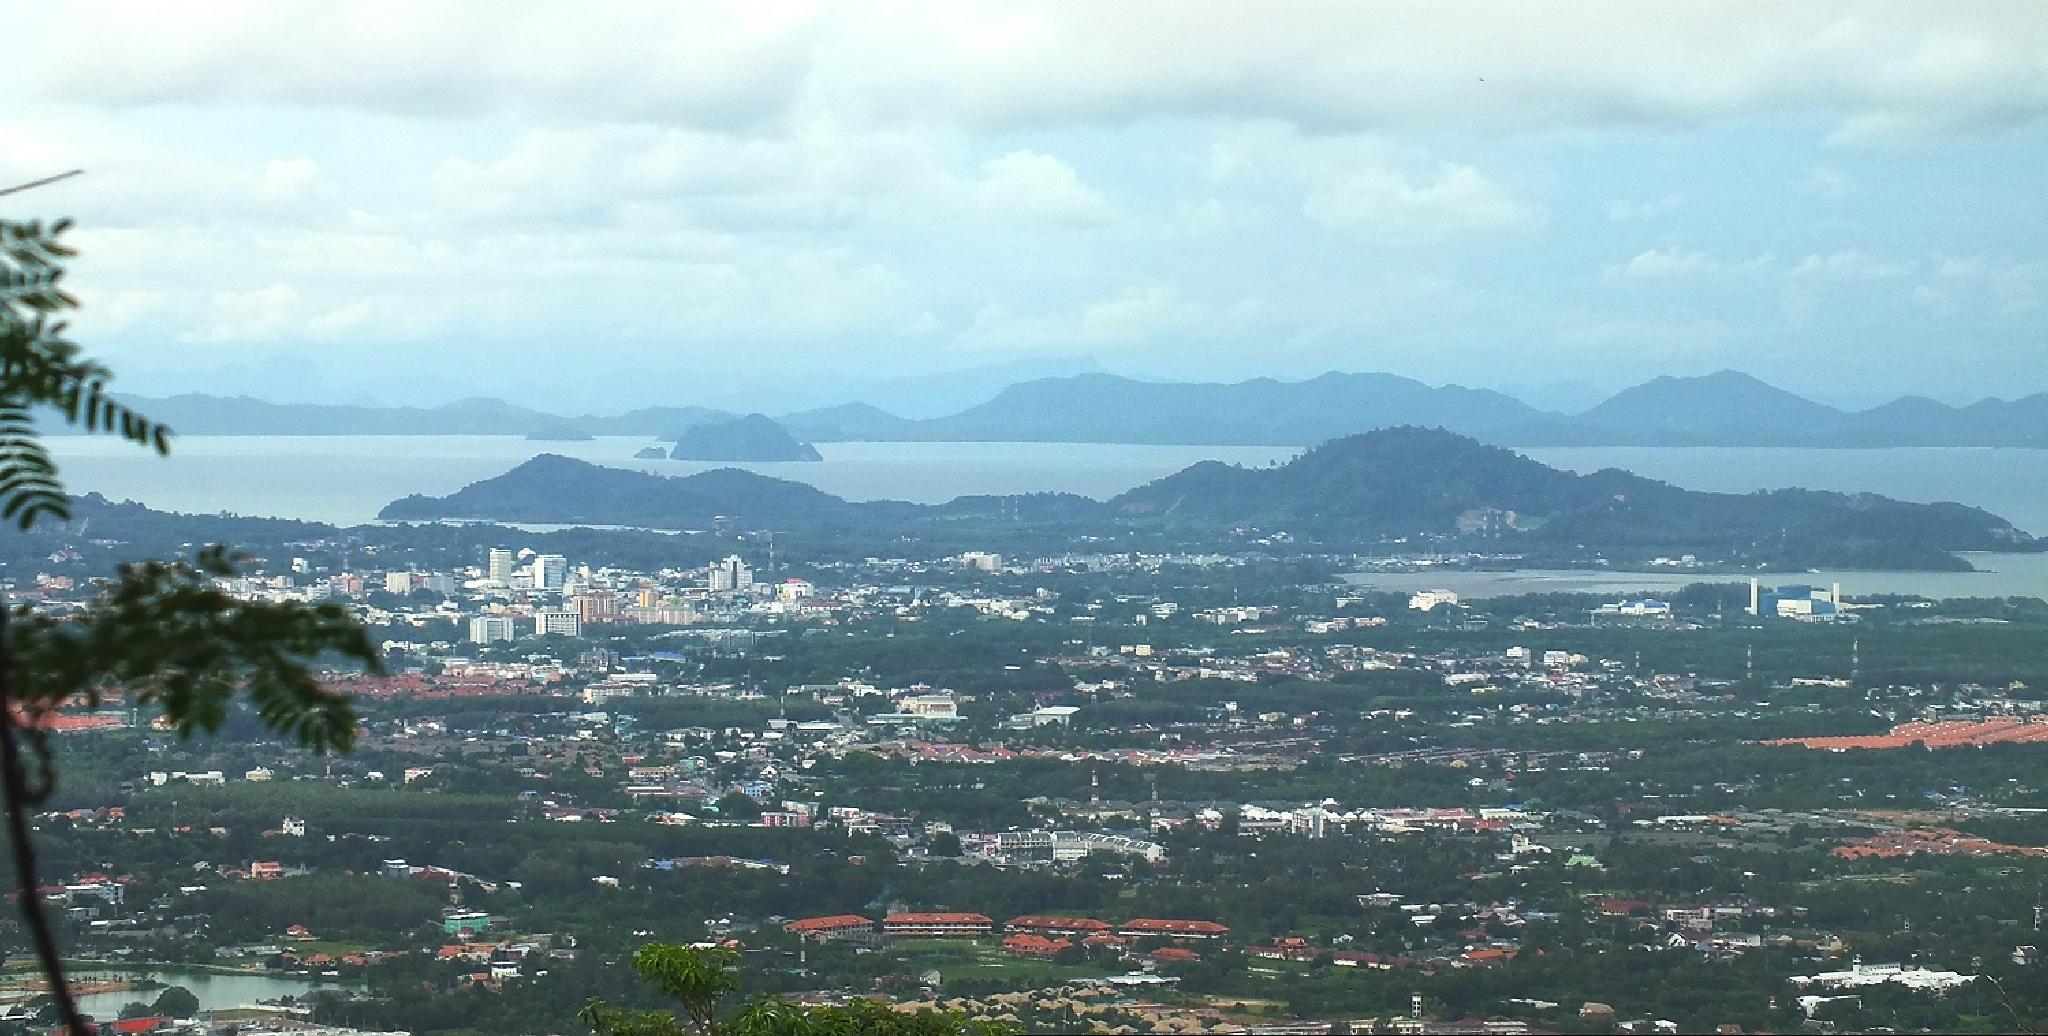 Phuket panorama by 407370